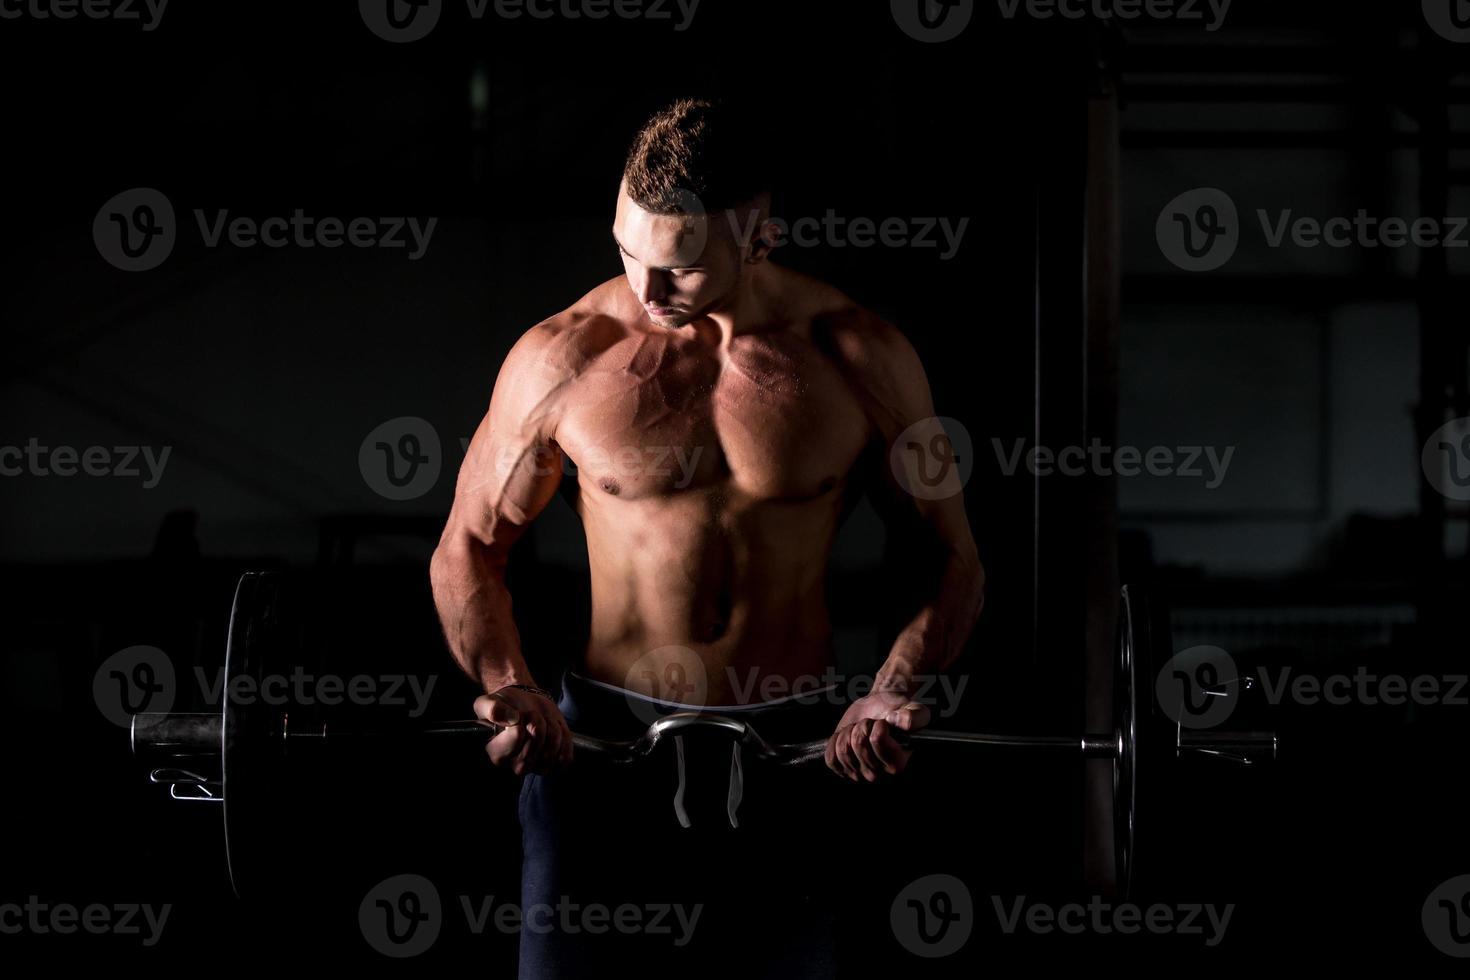 ung man lyfter en skivstång i gymmet foto